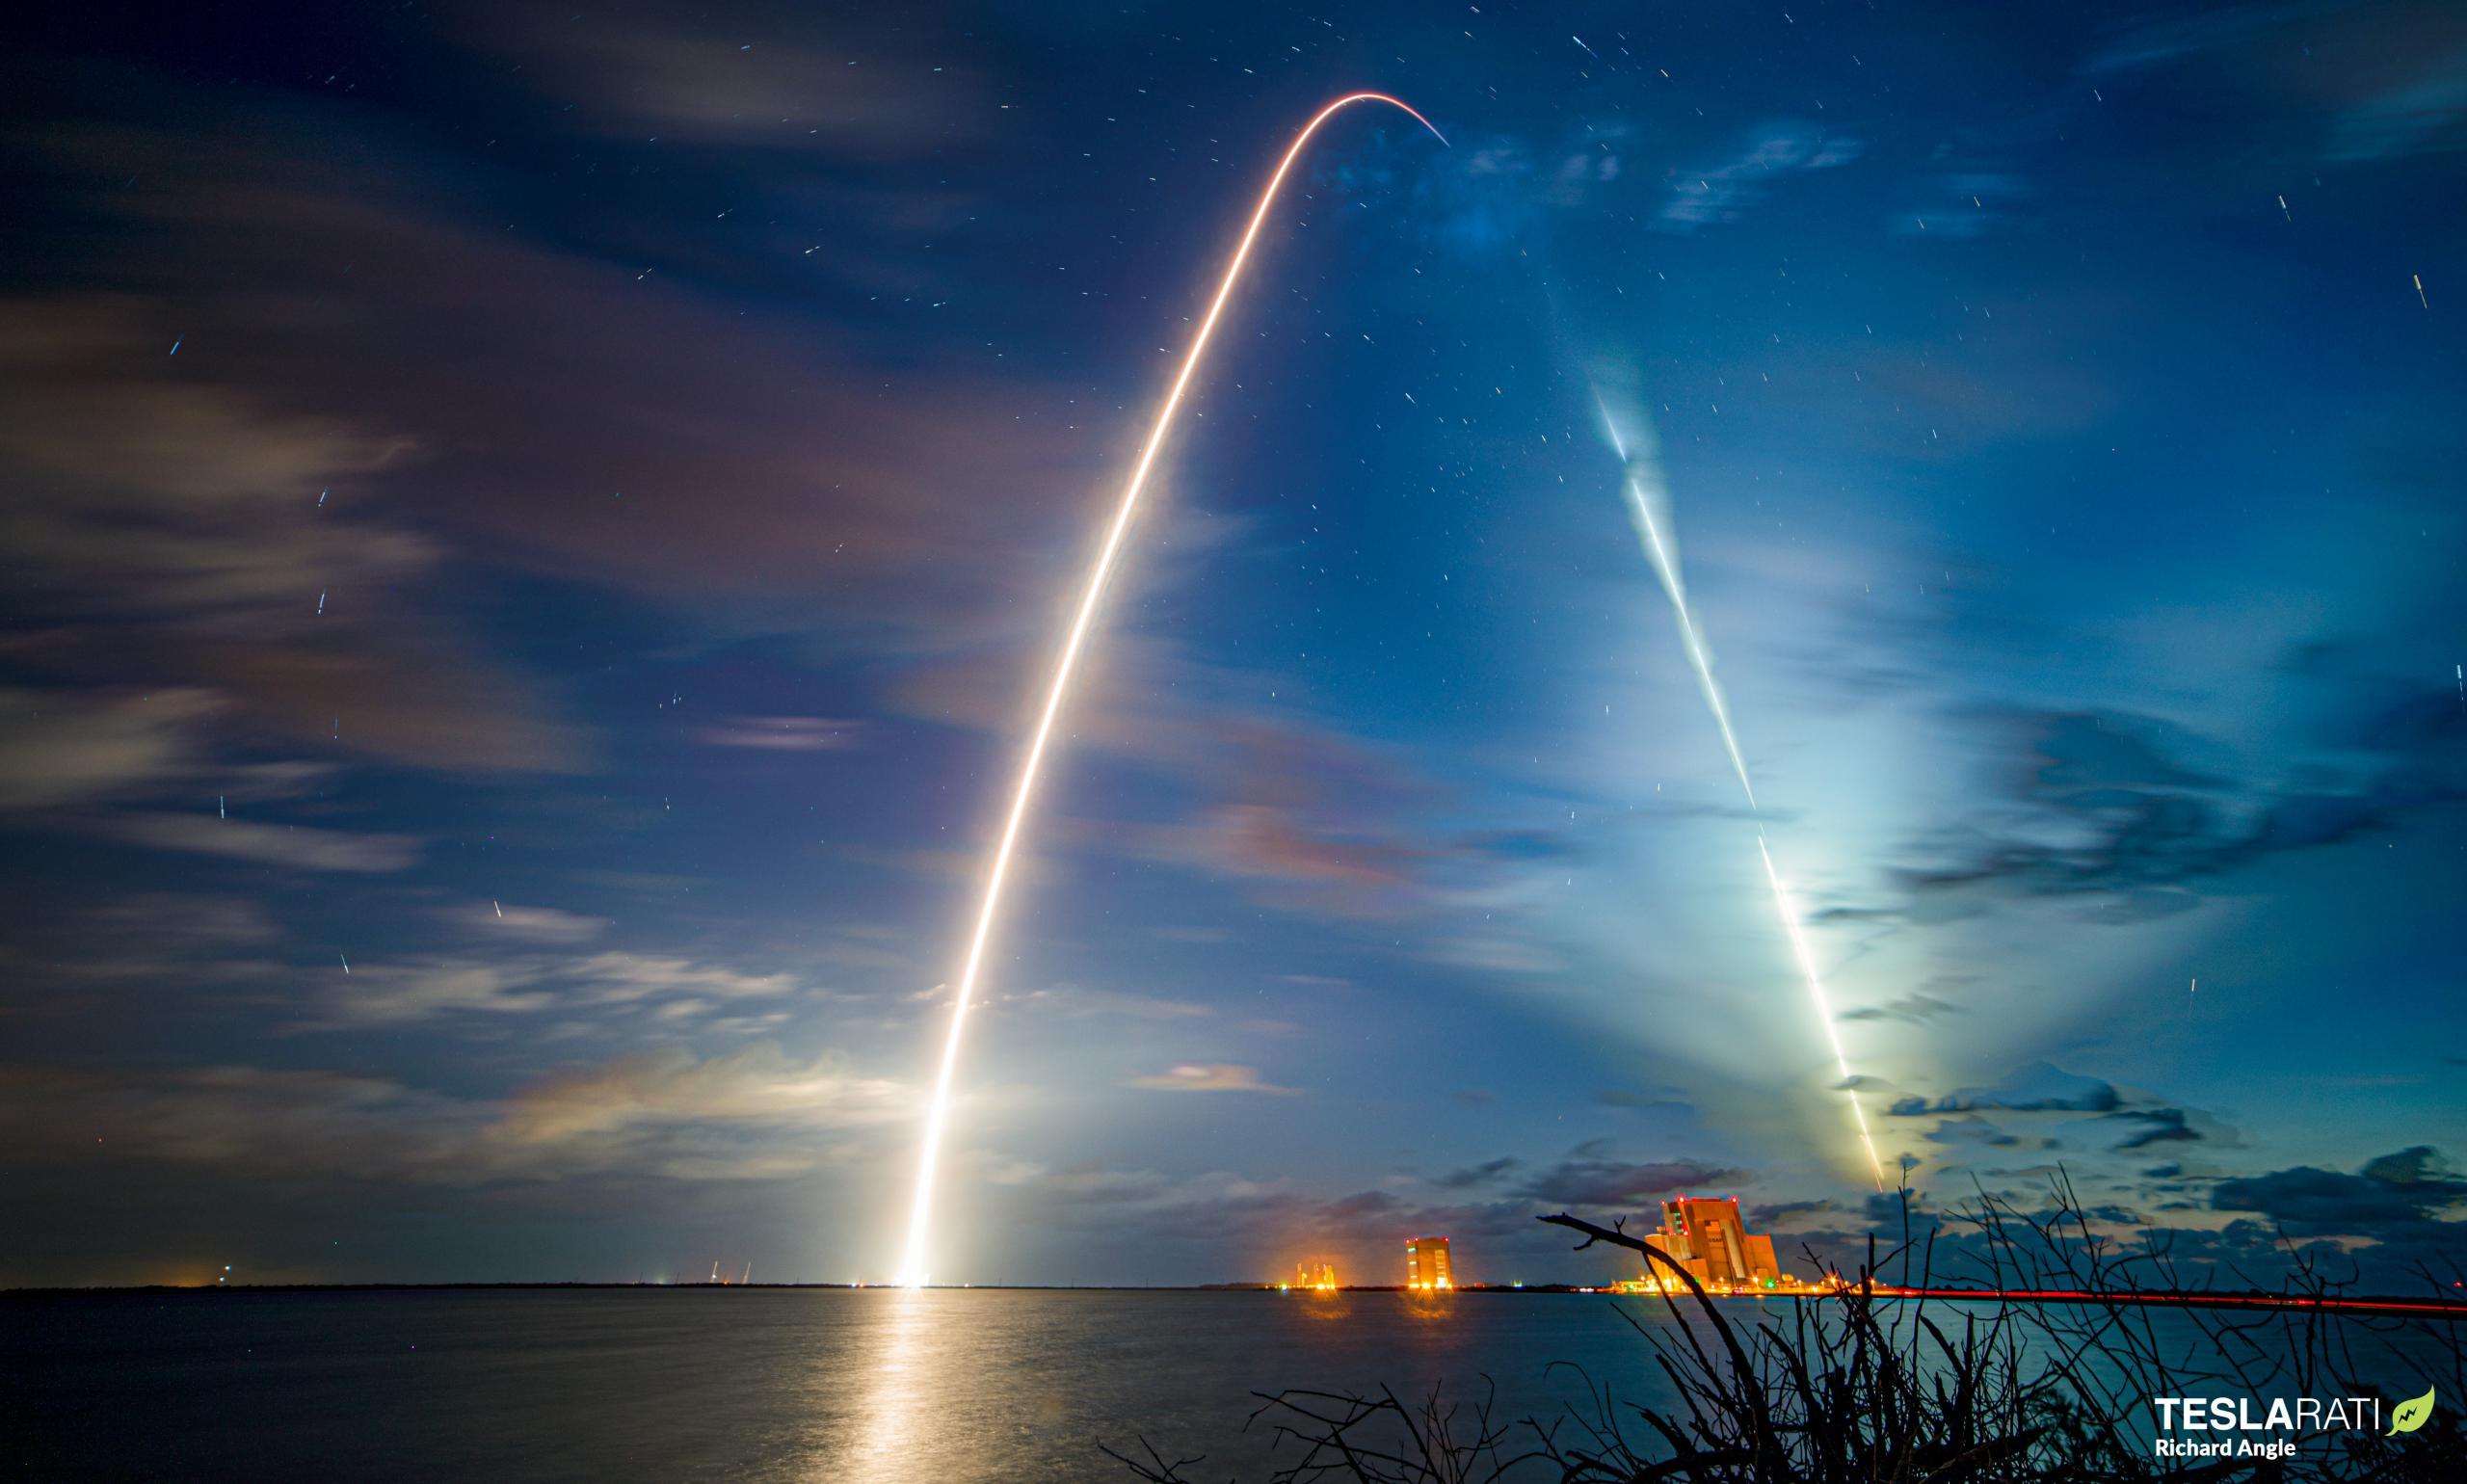 Crew-2 Crew Dragon C206 Falcon 9 B1061 39A 042321 (Richard Angle) streak 1 crop (c)